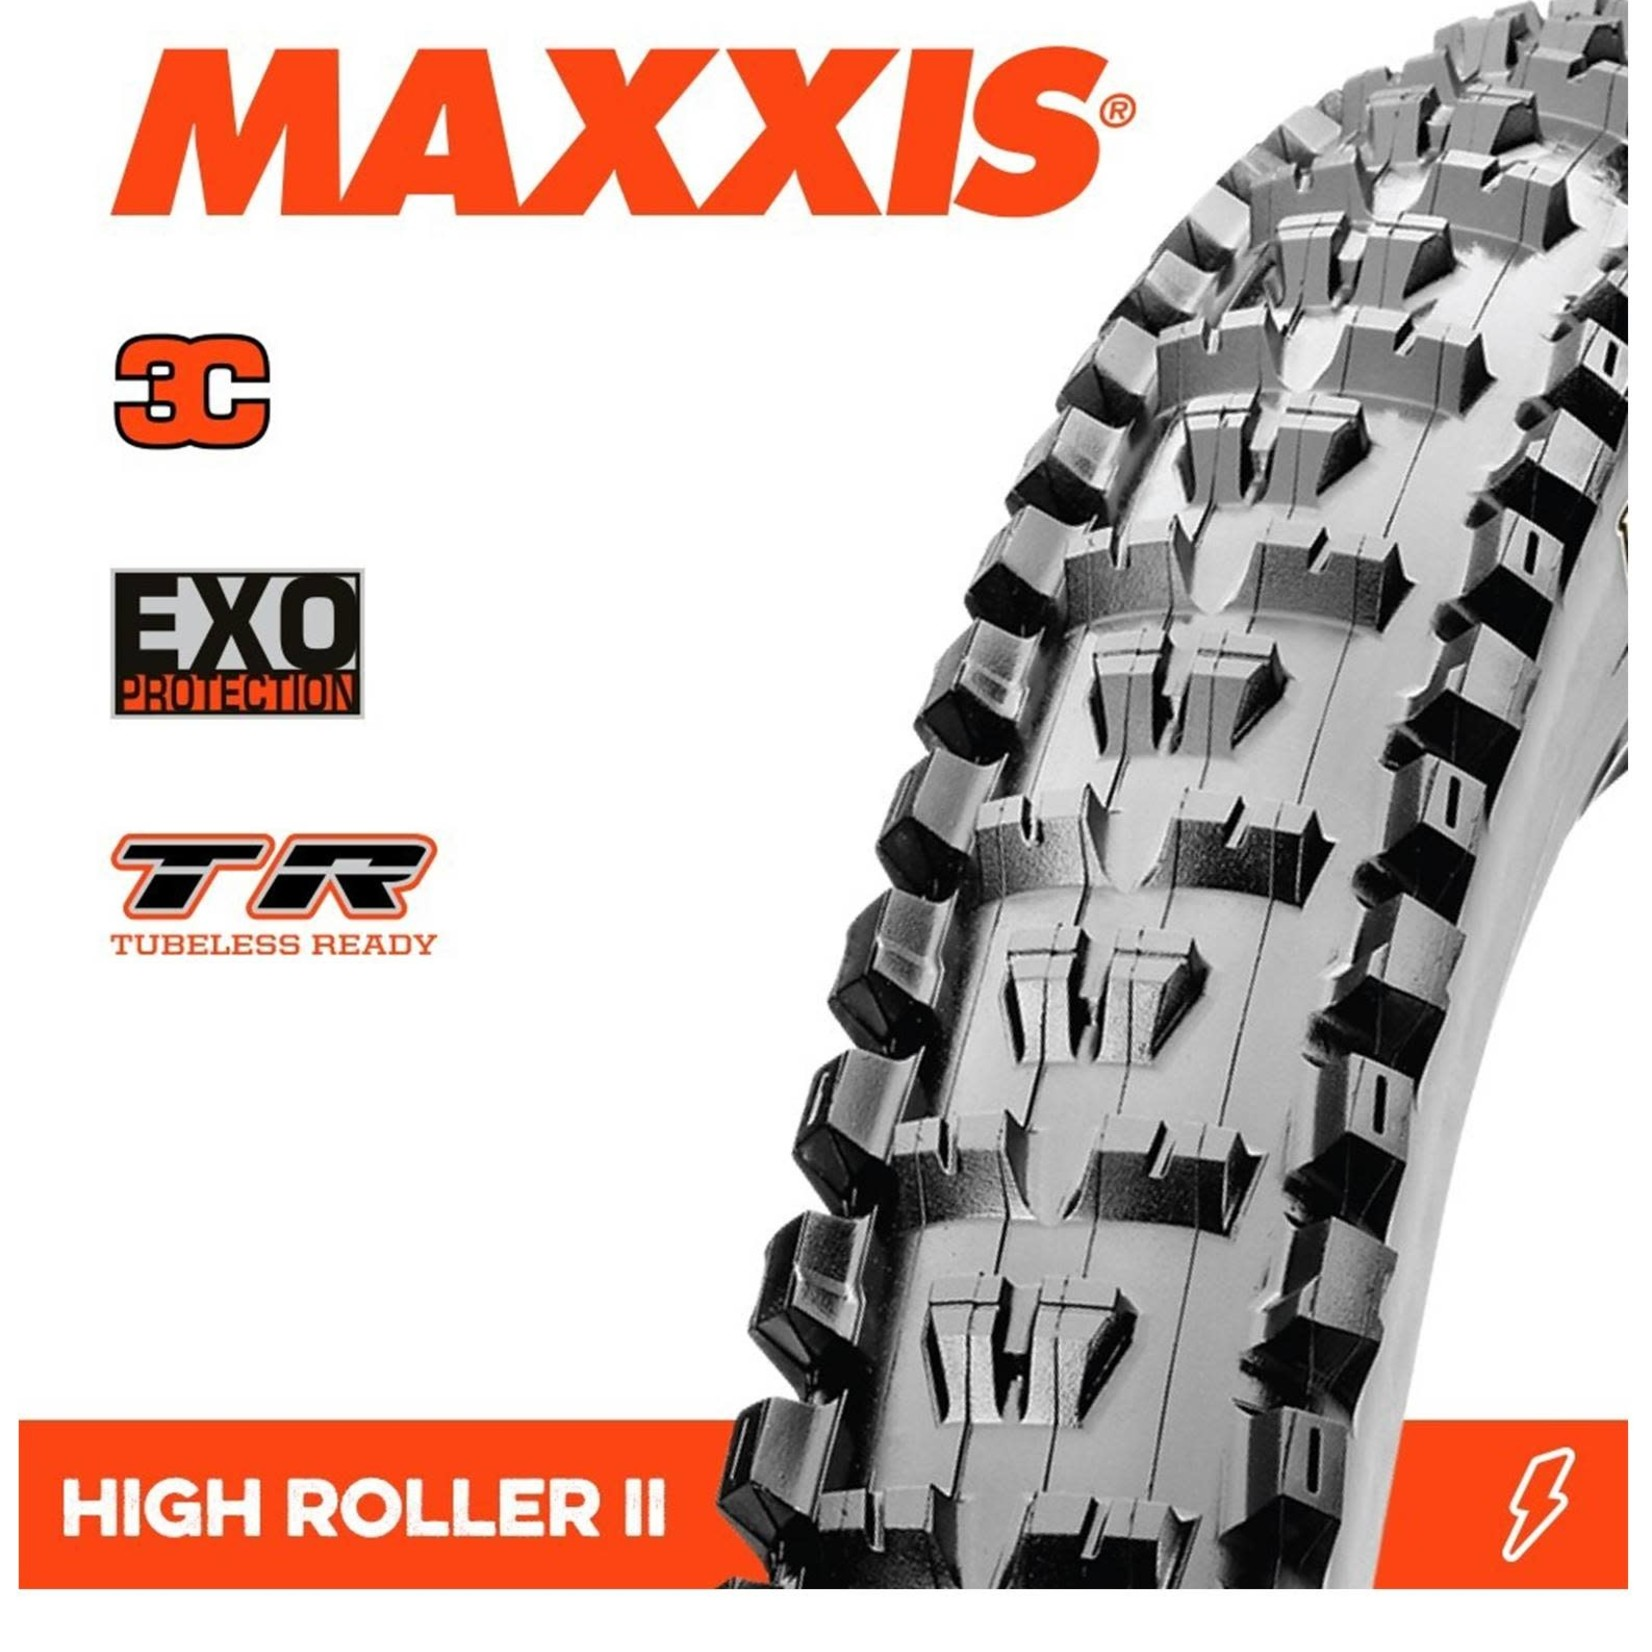 Maxxis Highroller II 29 x 2.3 3C EXO TR Tyre